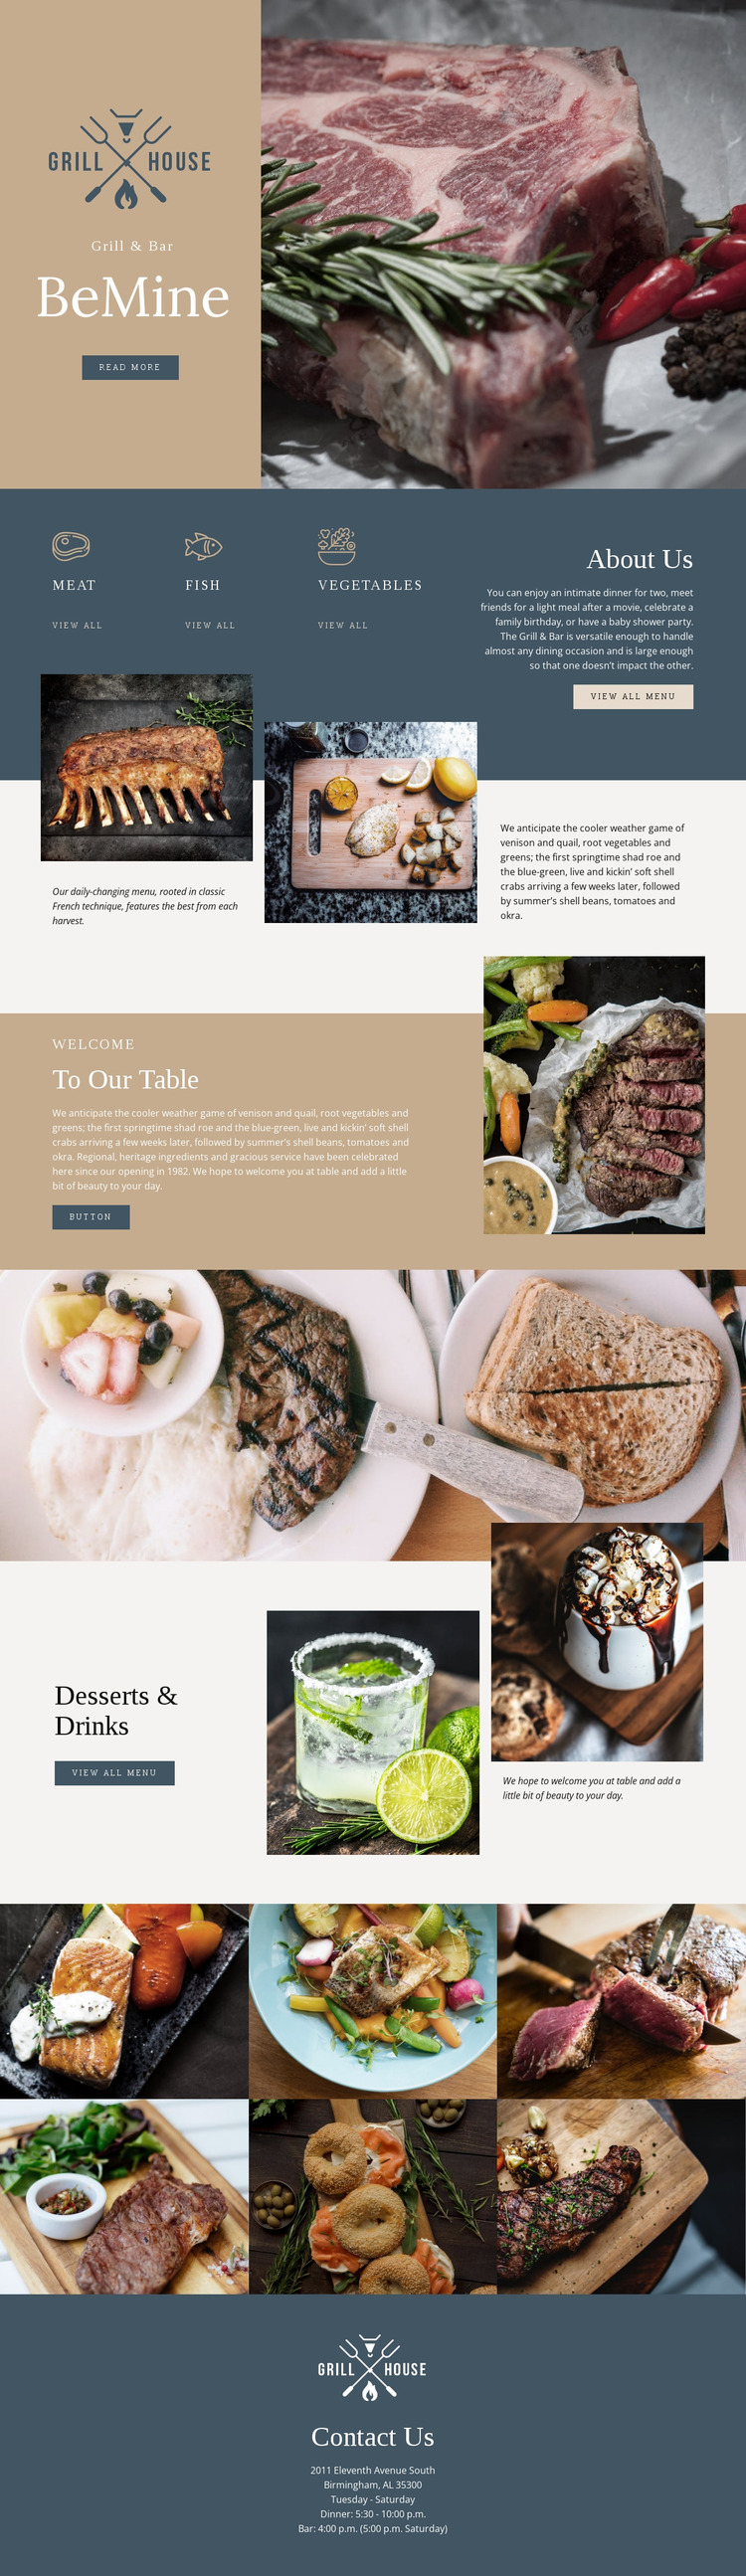 Finest grill house restaurant Website Mockup